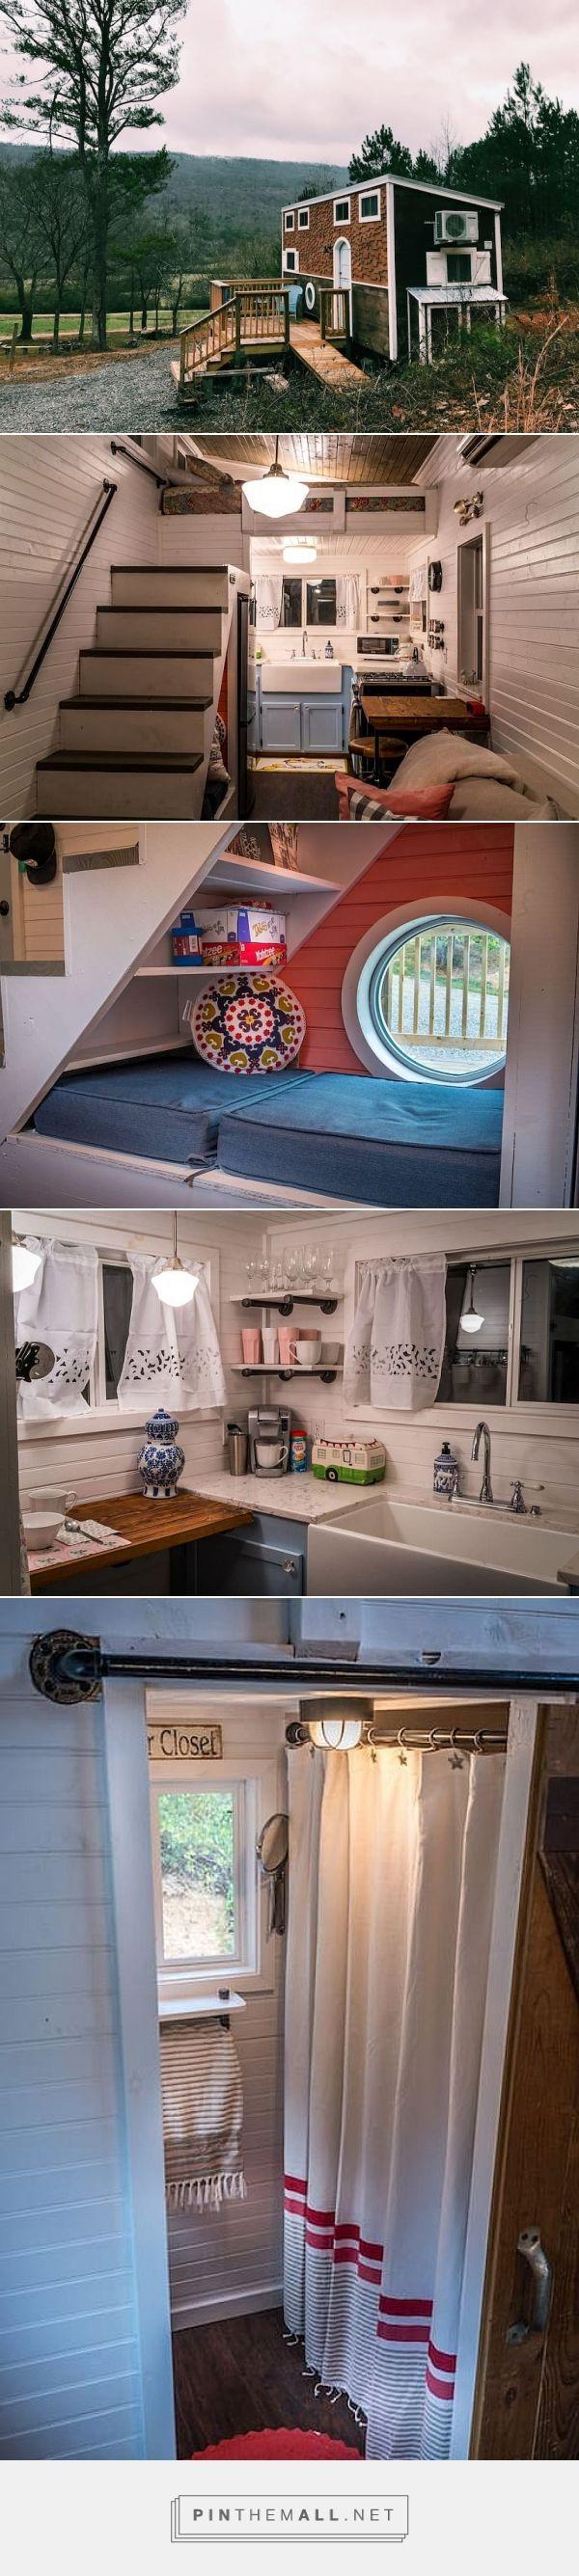 Best 25+ Small House Renovation Ideas On Pinterest   Home Renovation,  Kitchen Reno And Small Kitchen Bar